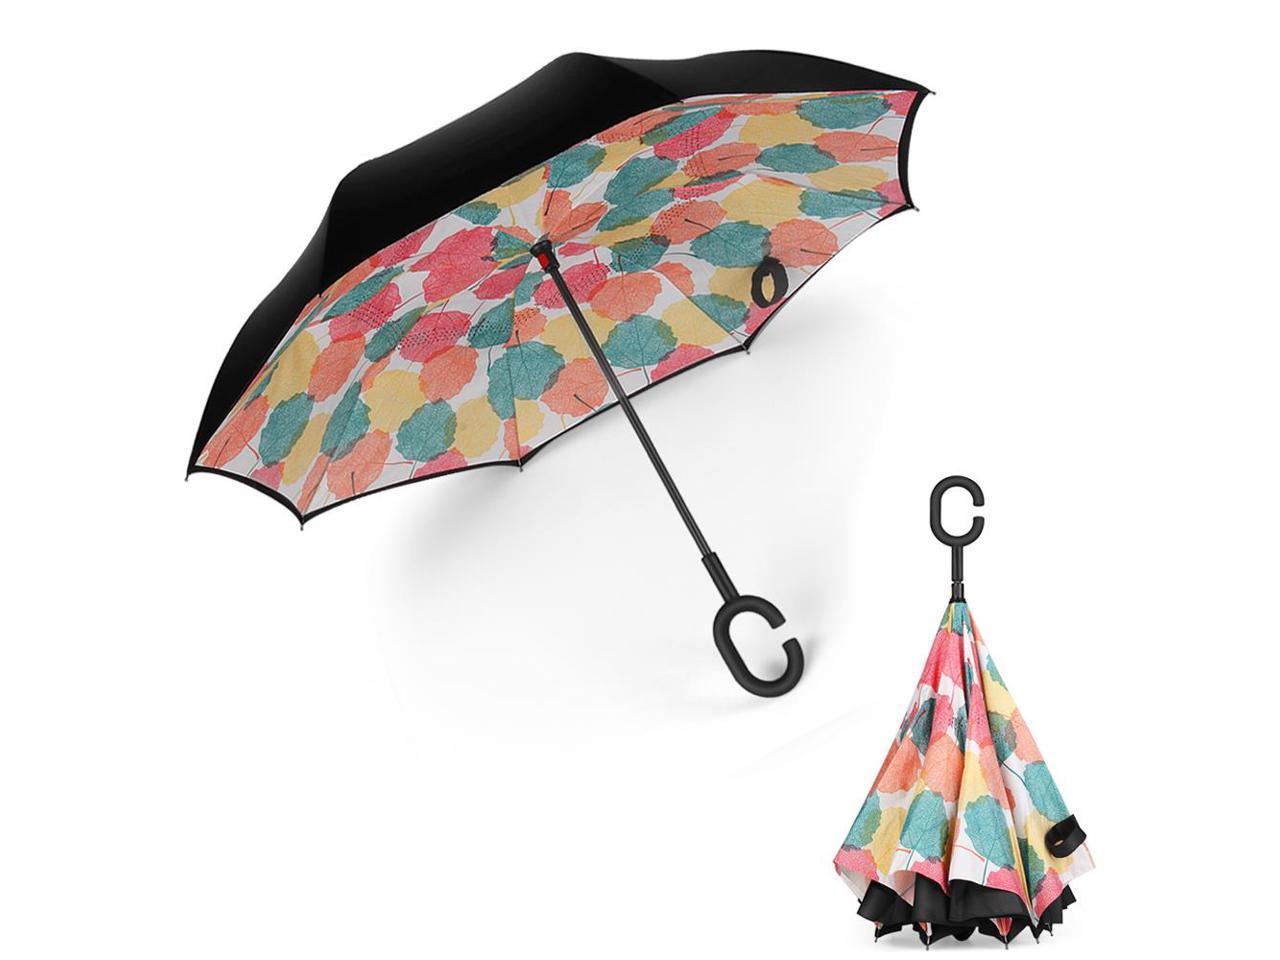 Double Layer Inverted Umbrellas with Cartoon Vegetable Garden Print Windproof Reverse Folding Umbrella for Car C-Shaped Handle Umbrella